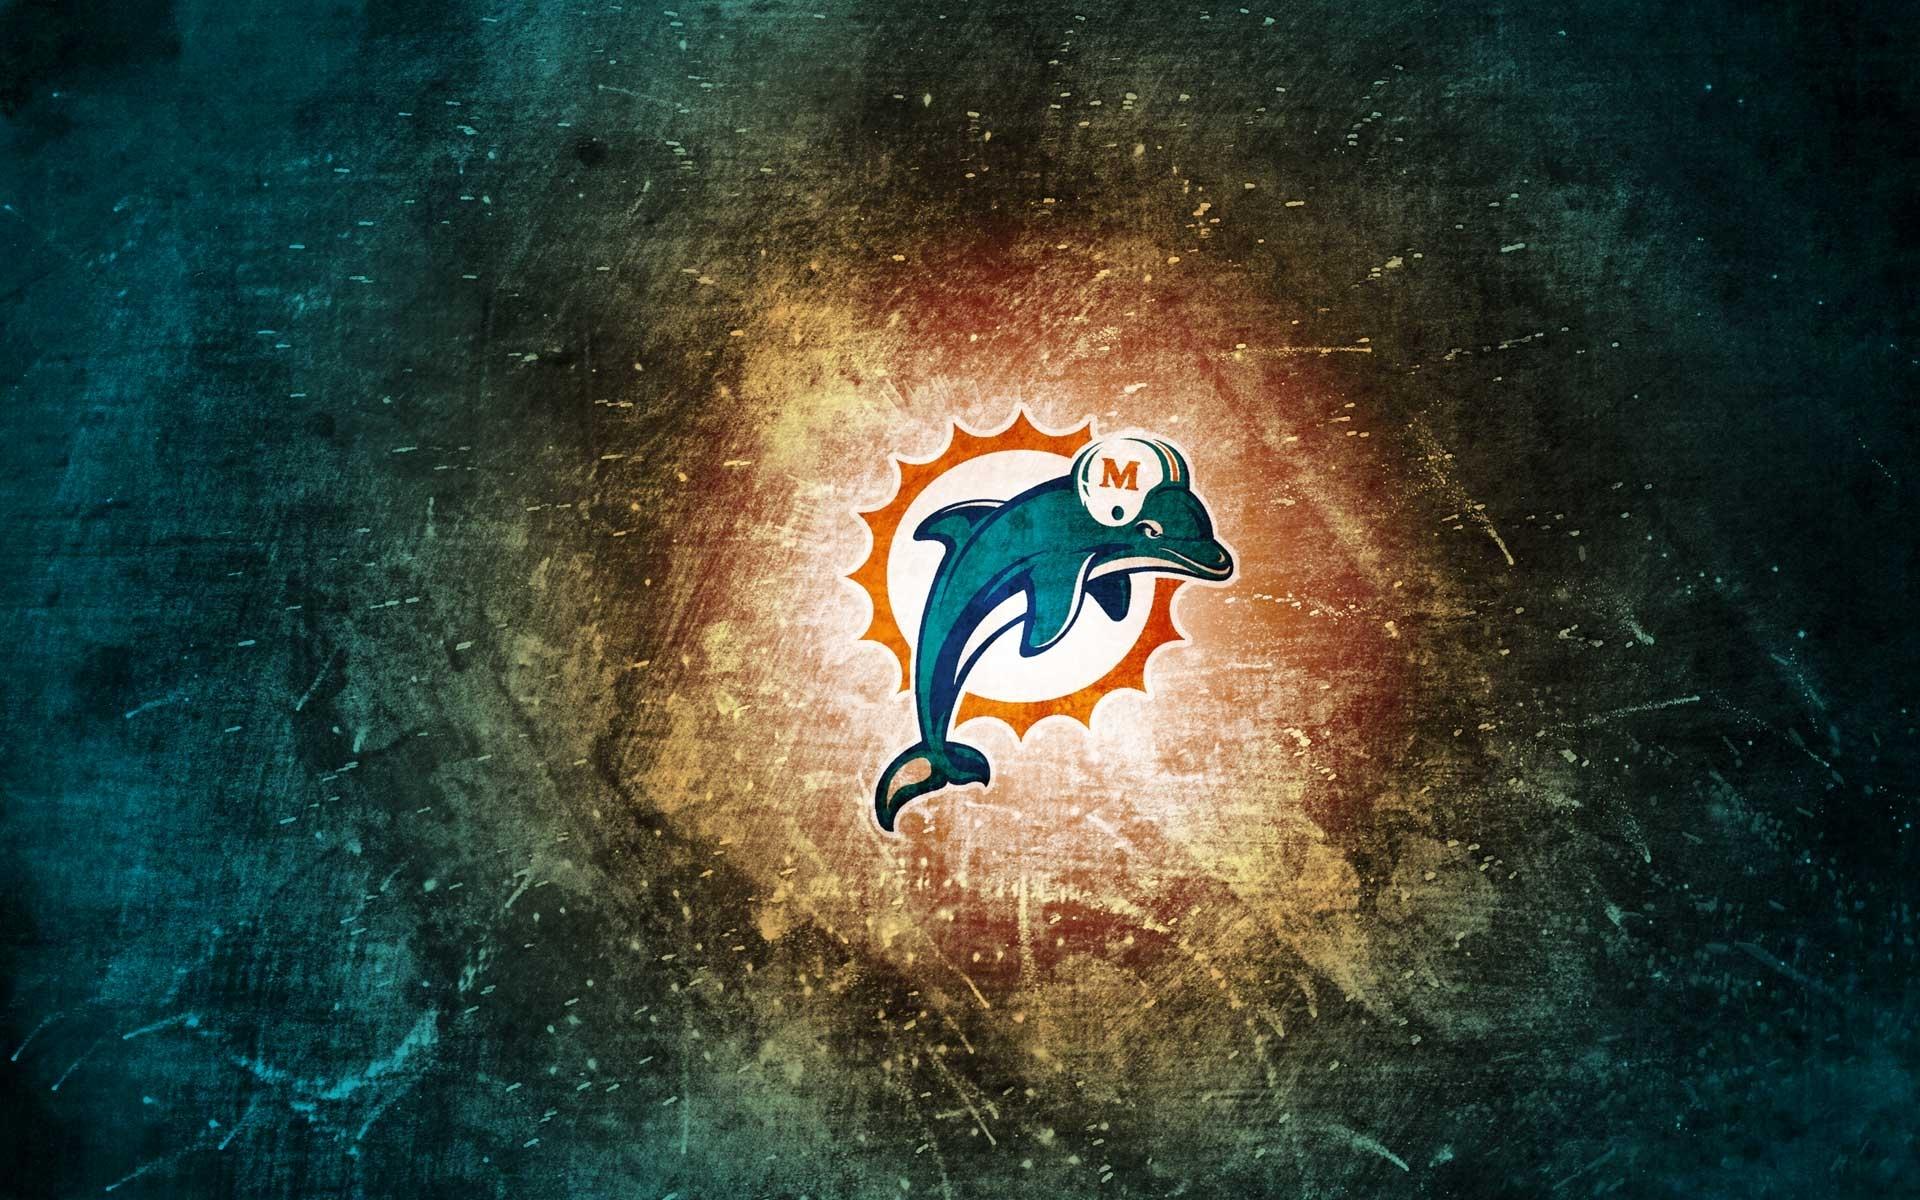 images-logo-miami-dolphins - wallpaper.wiki